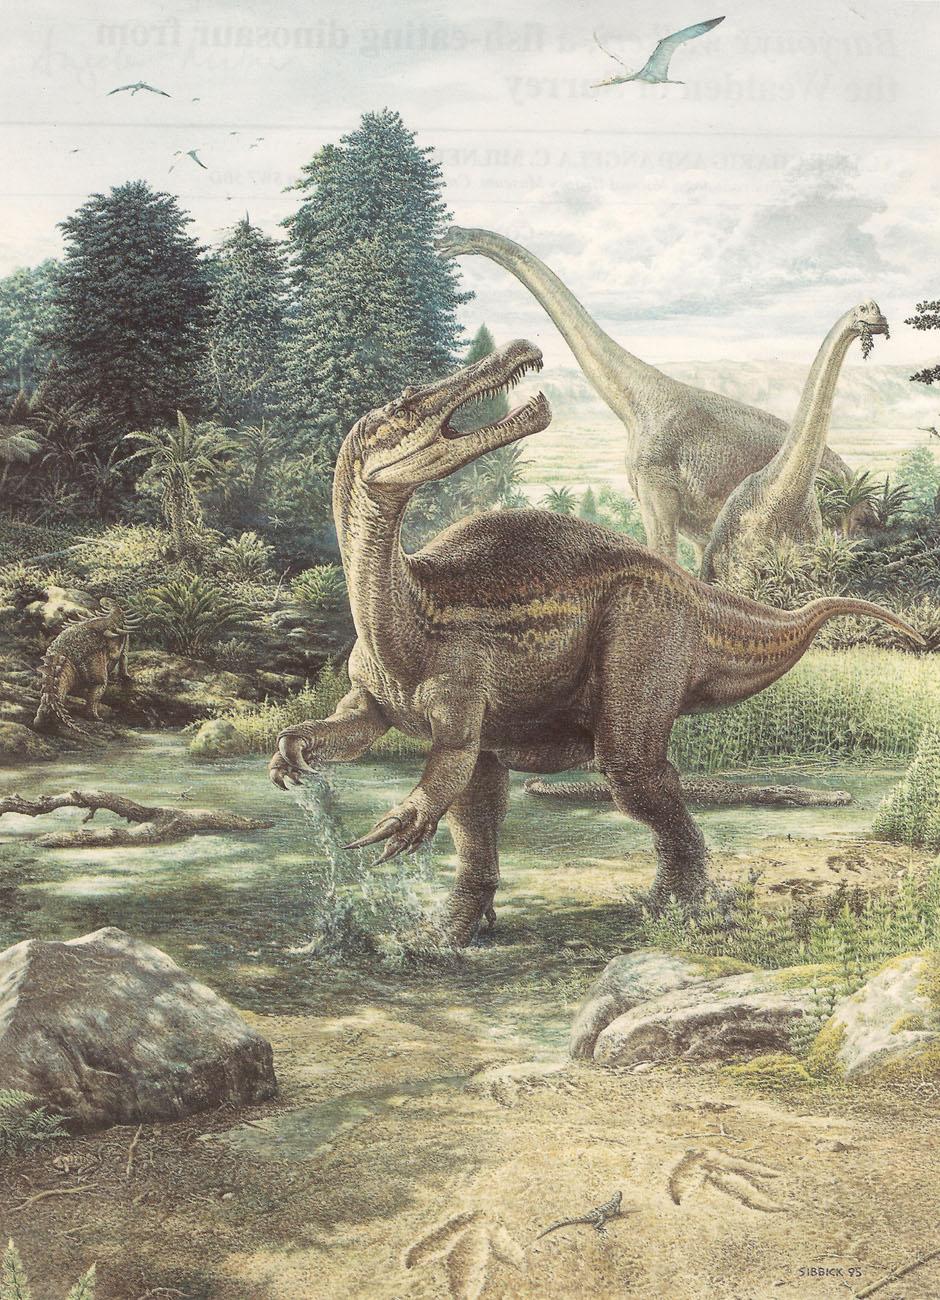 spinosauridae dessin de baryonyx john sibbick